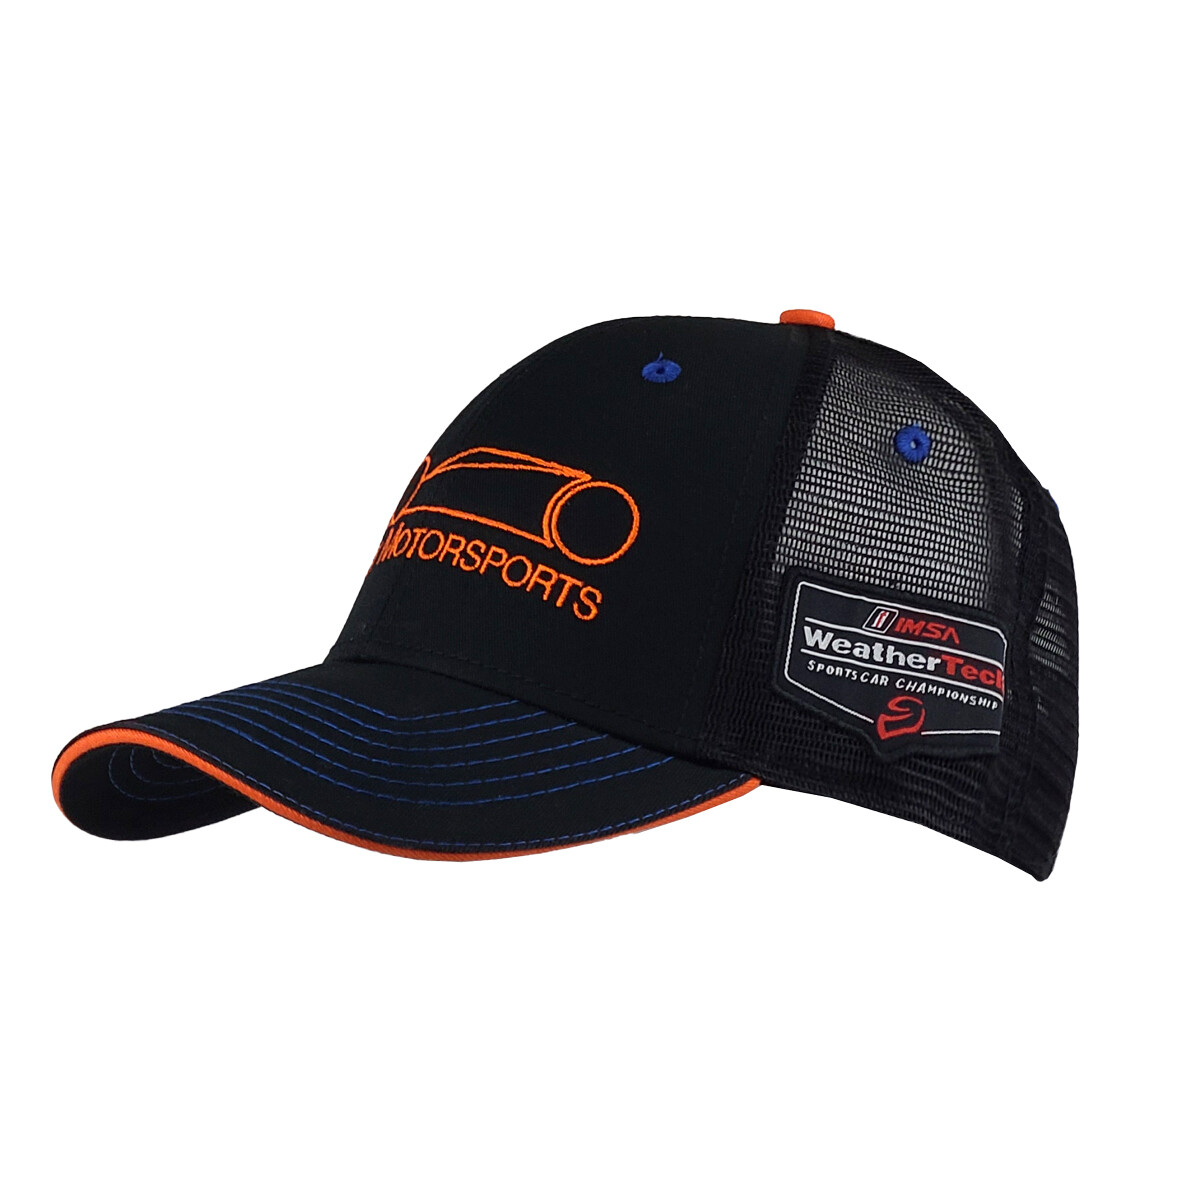 Riley MotorSports Hat - Black